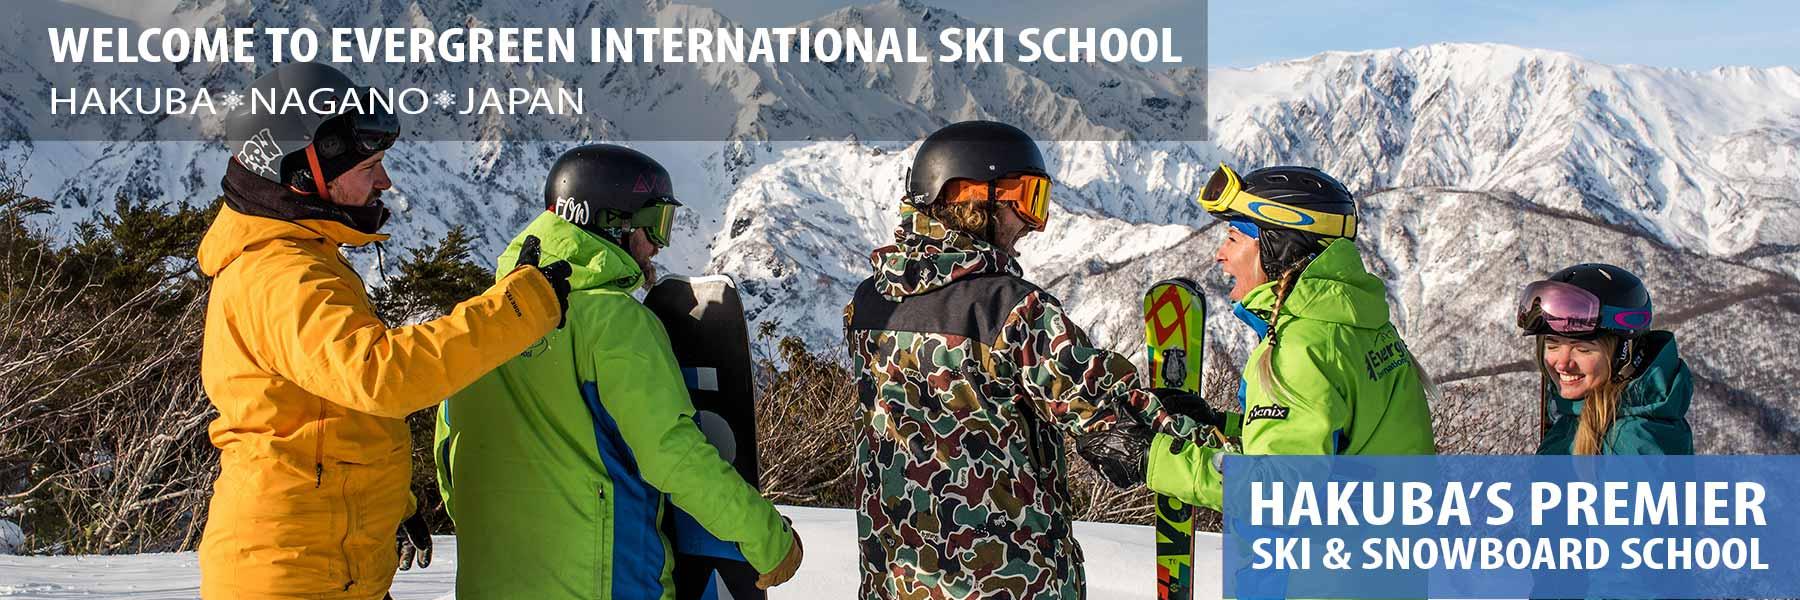 hakuba ski school header - group snowboard lessons